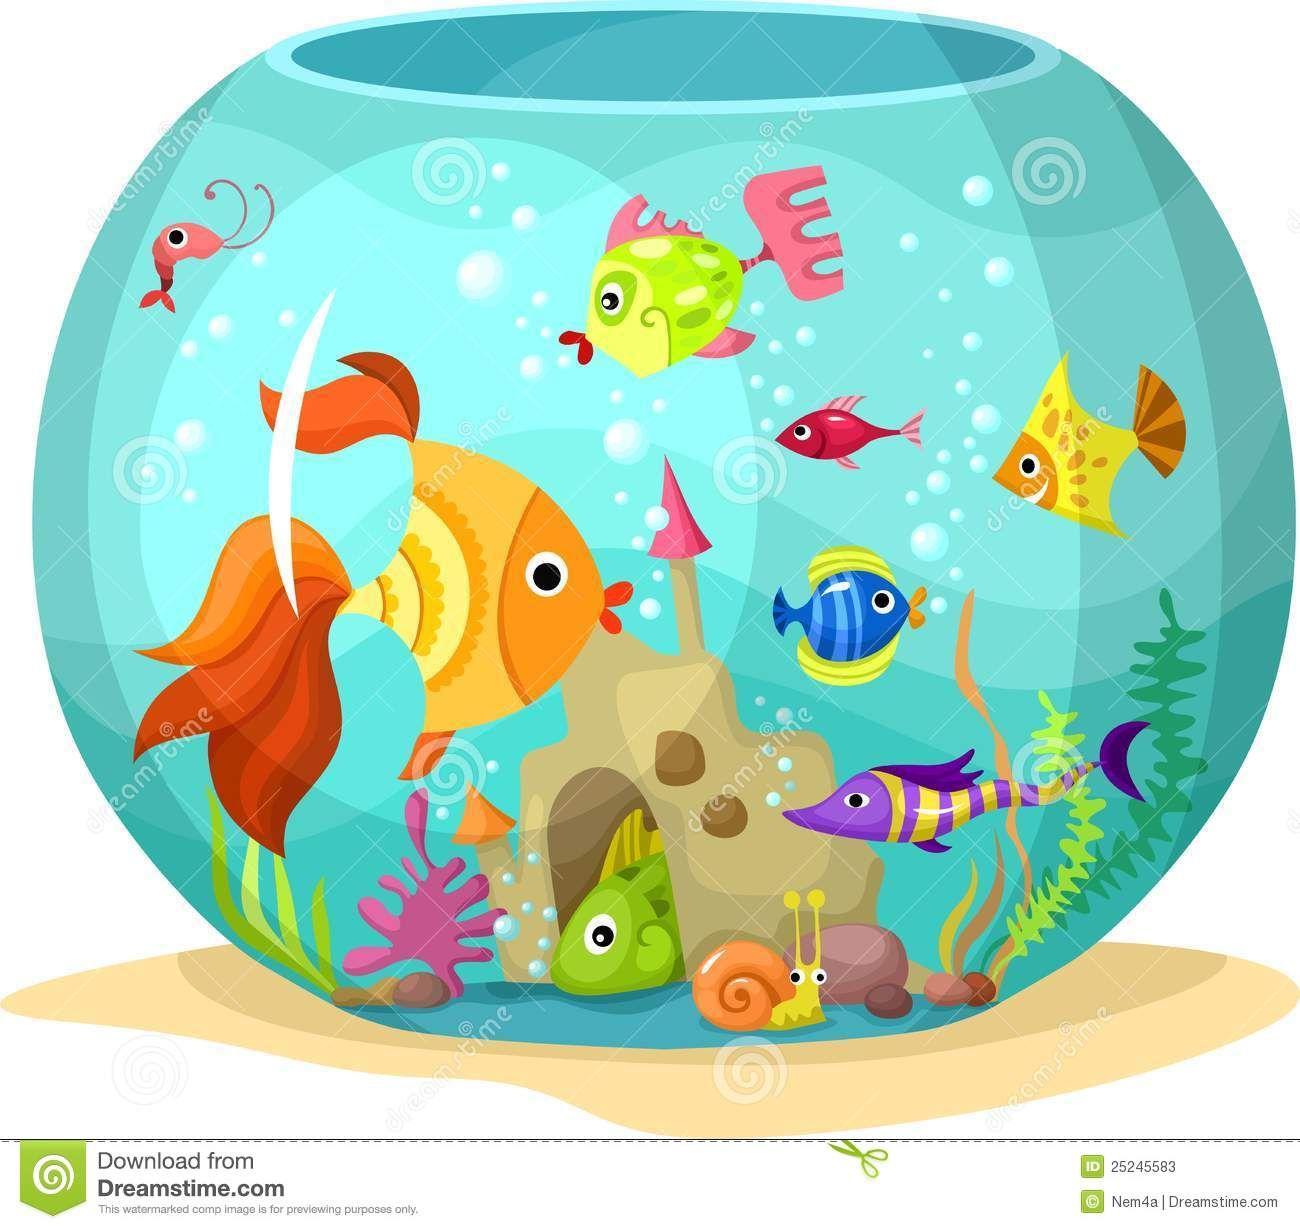 Illustration google search pop. Palace clipart fish tank